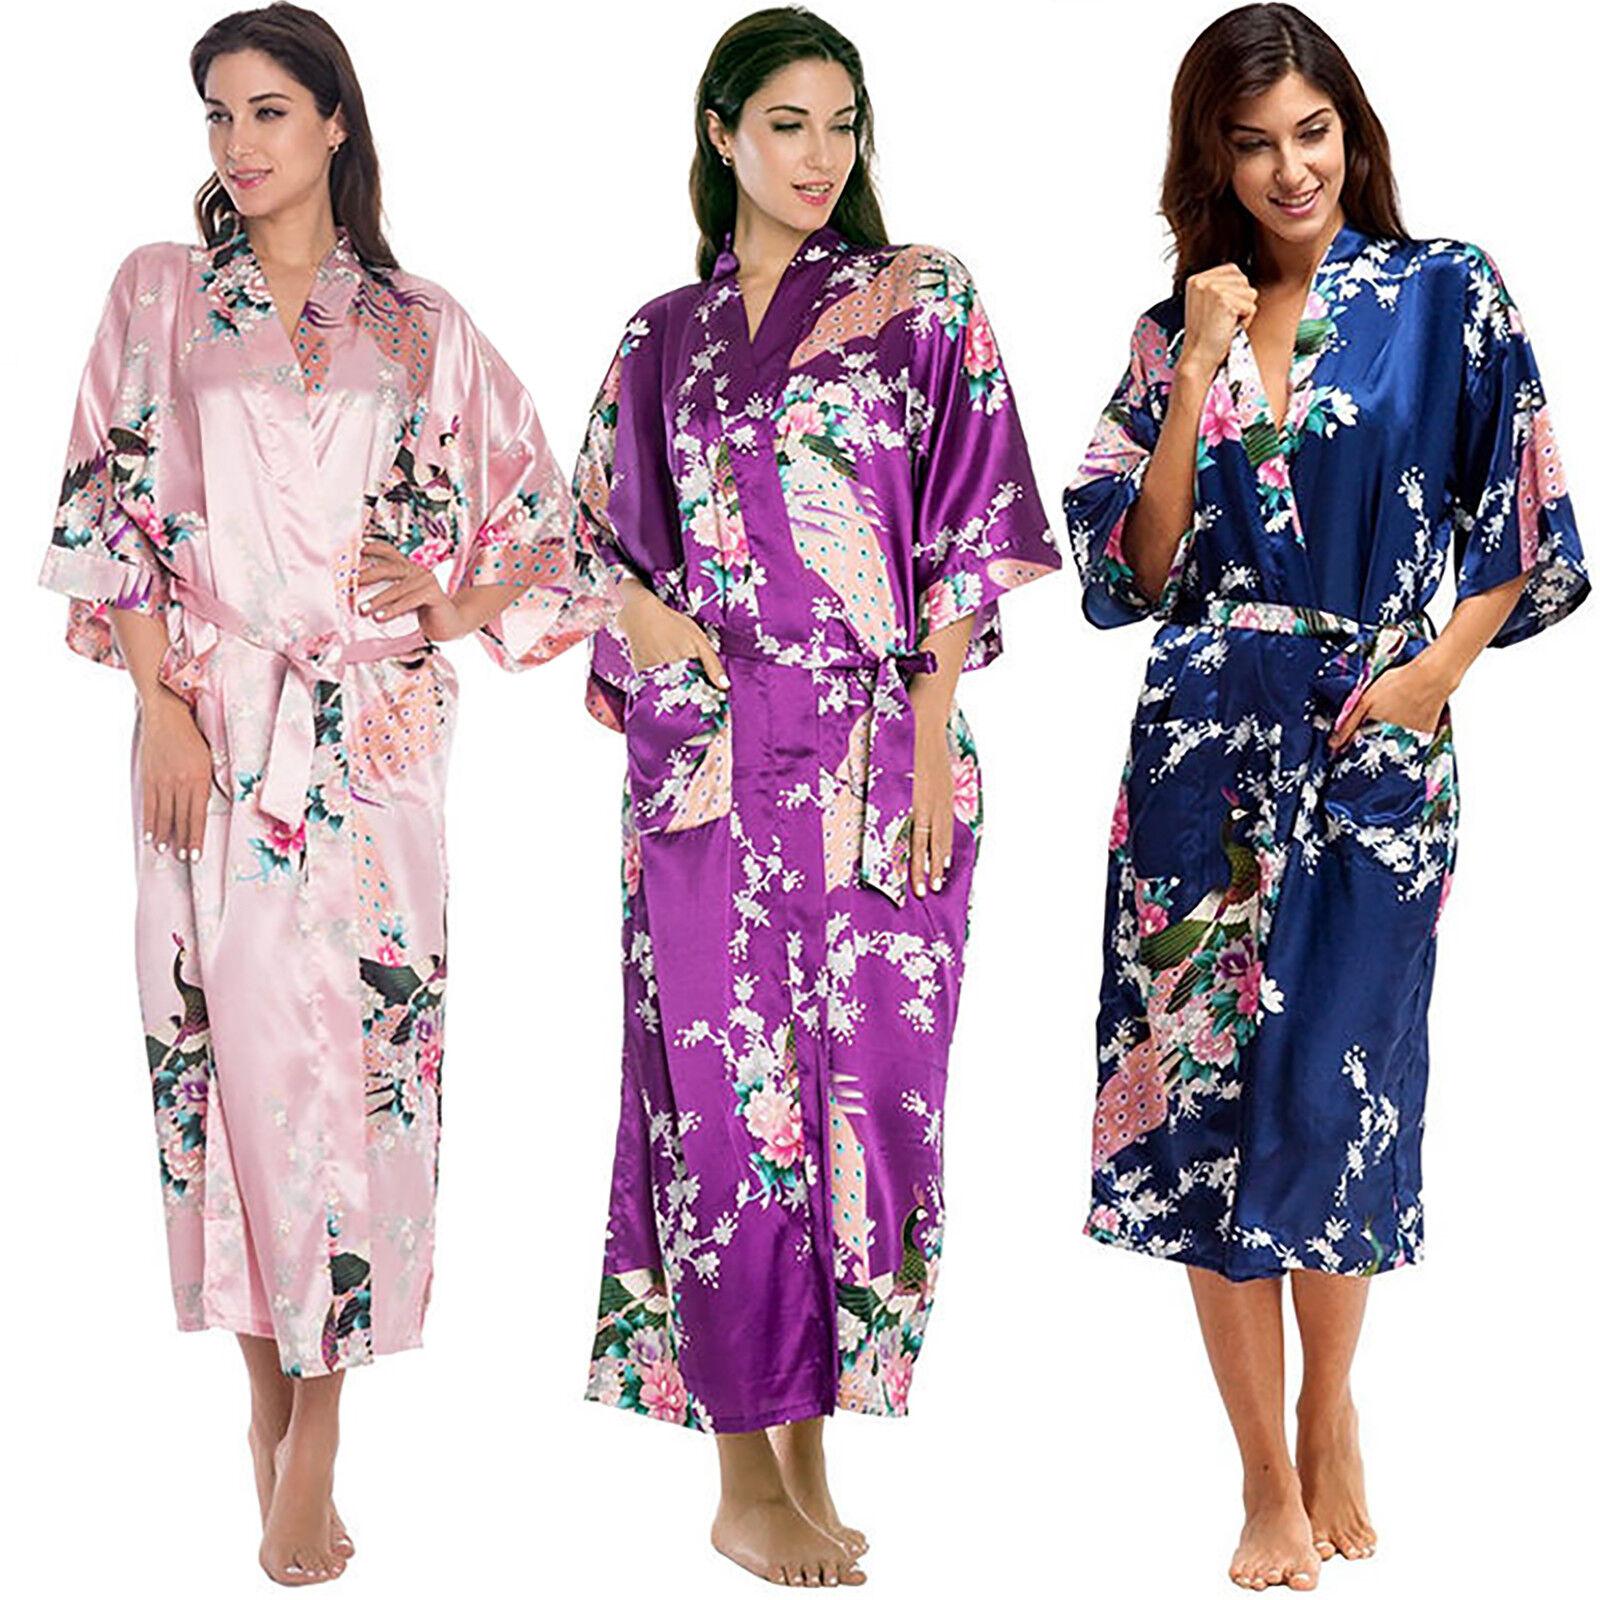 Women's Long Silk Bridal Robe Bathrobe Satin Silky Night Gown Bridesmaid Kimono